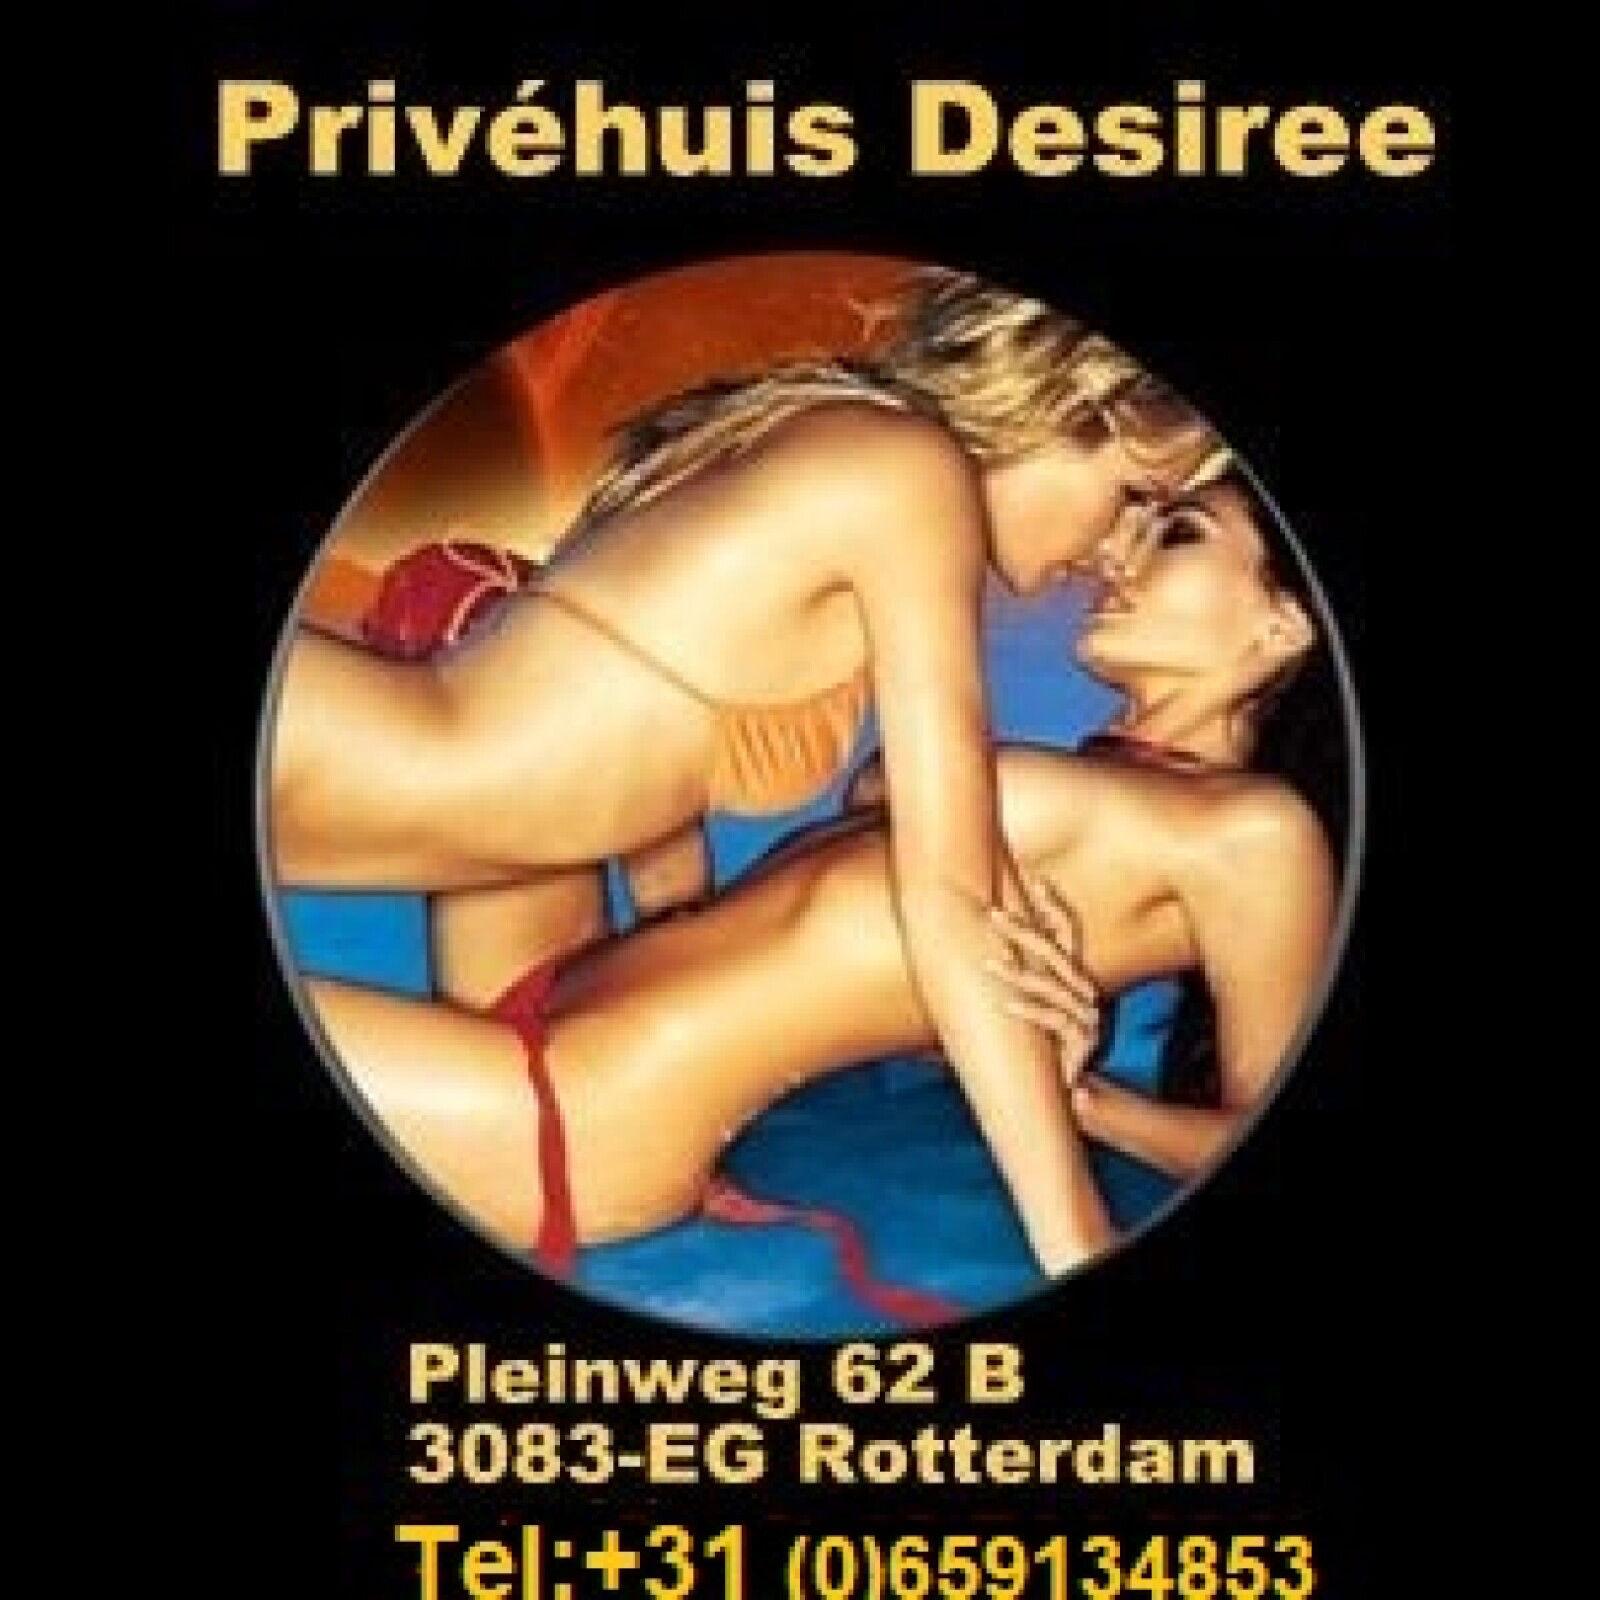 privehuis-desiree